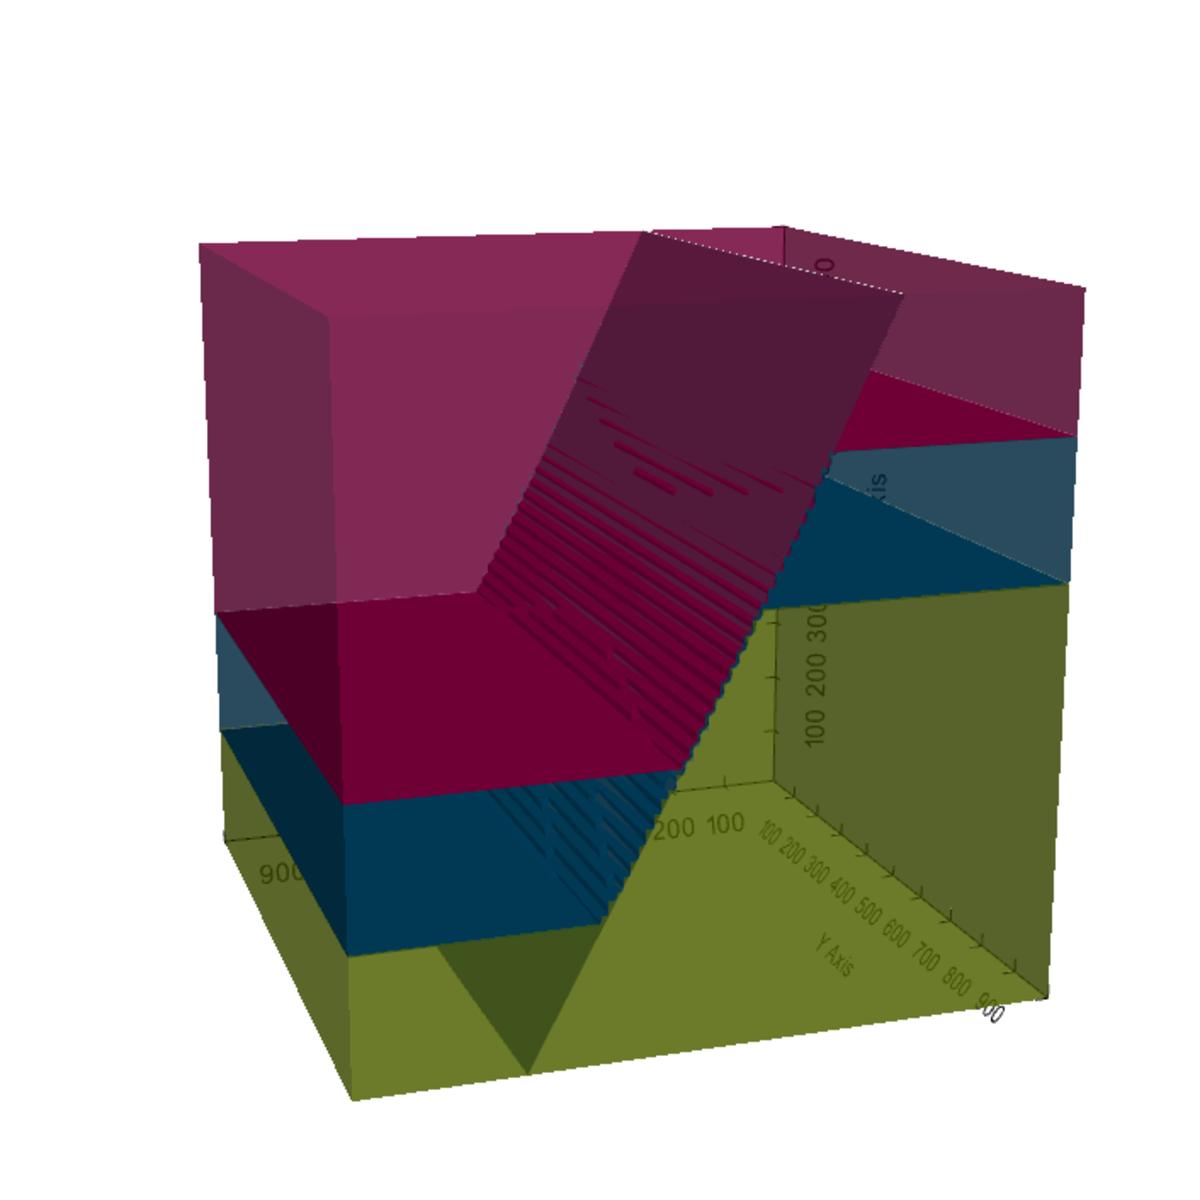 colormapped image plot thumbnail